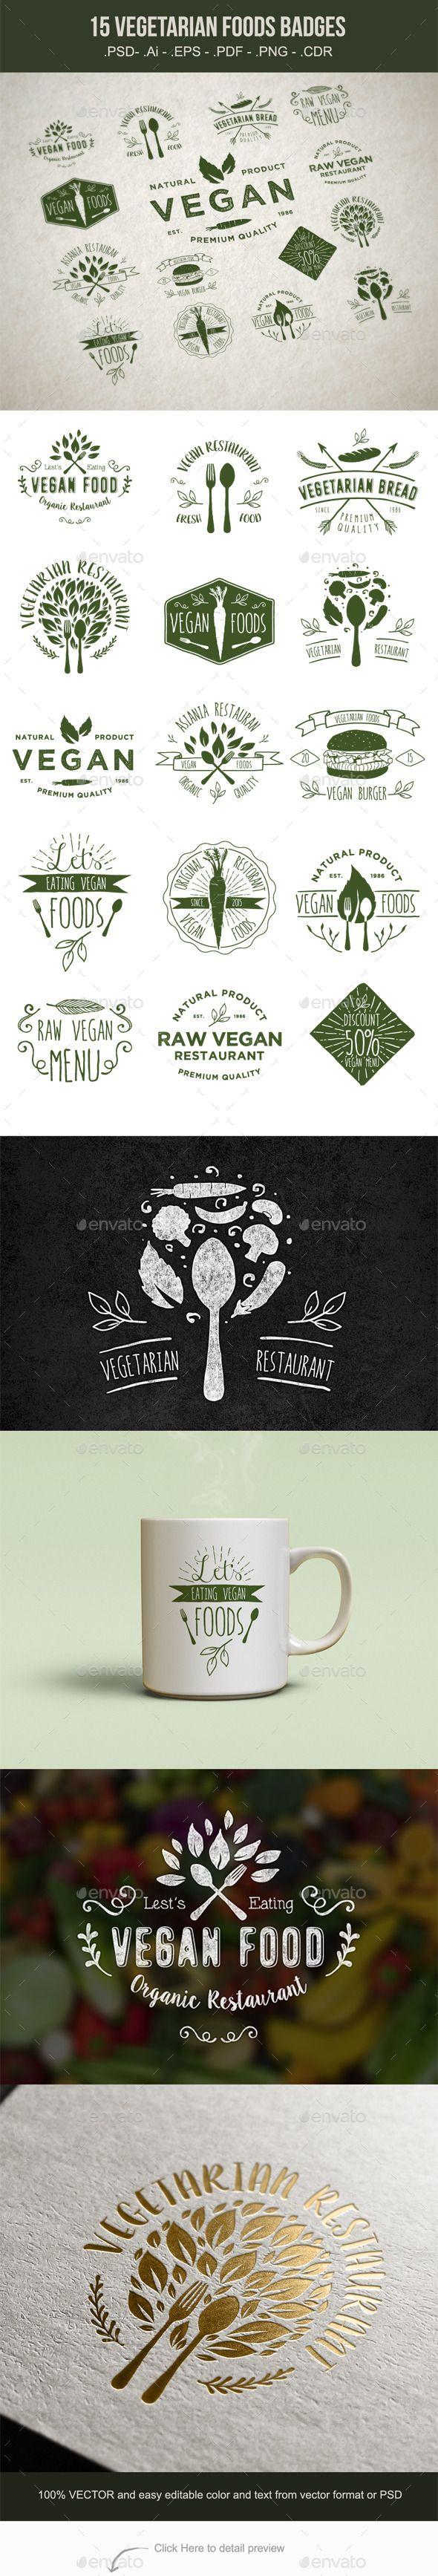 15 Vegetarian Foods Badges Vector Template #design Download: http://graphicriver.net/item/15-vegetarian-foods-badges/11184810?ref=ksioks